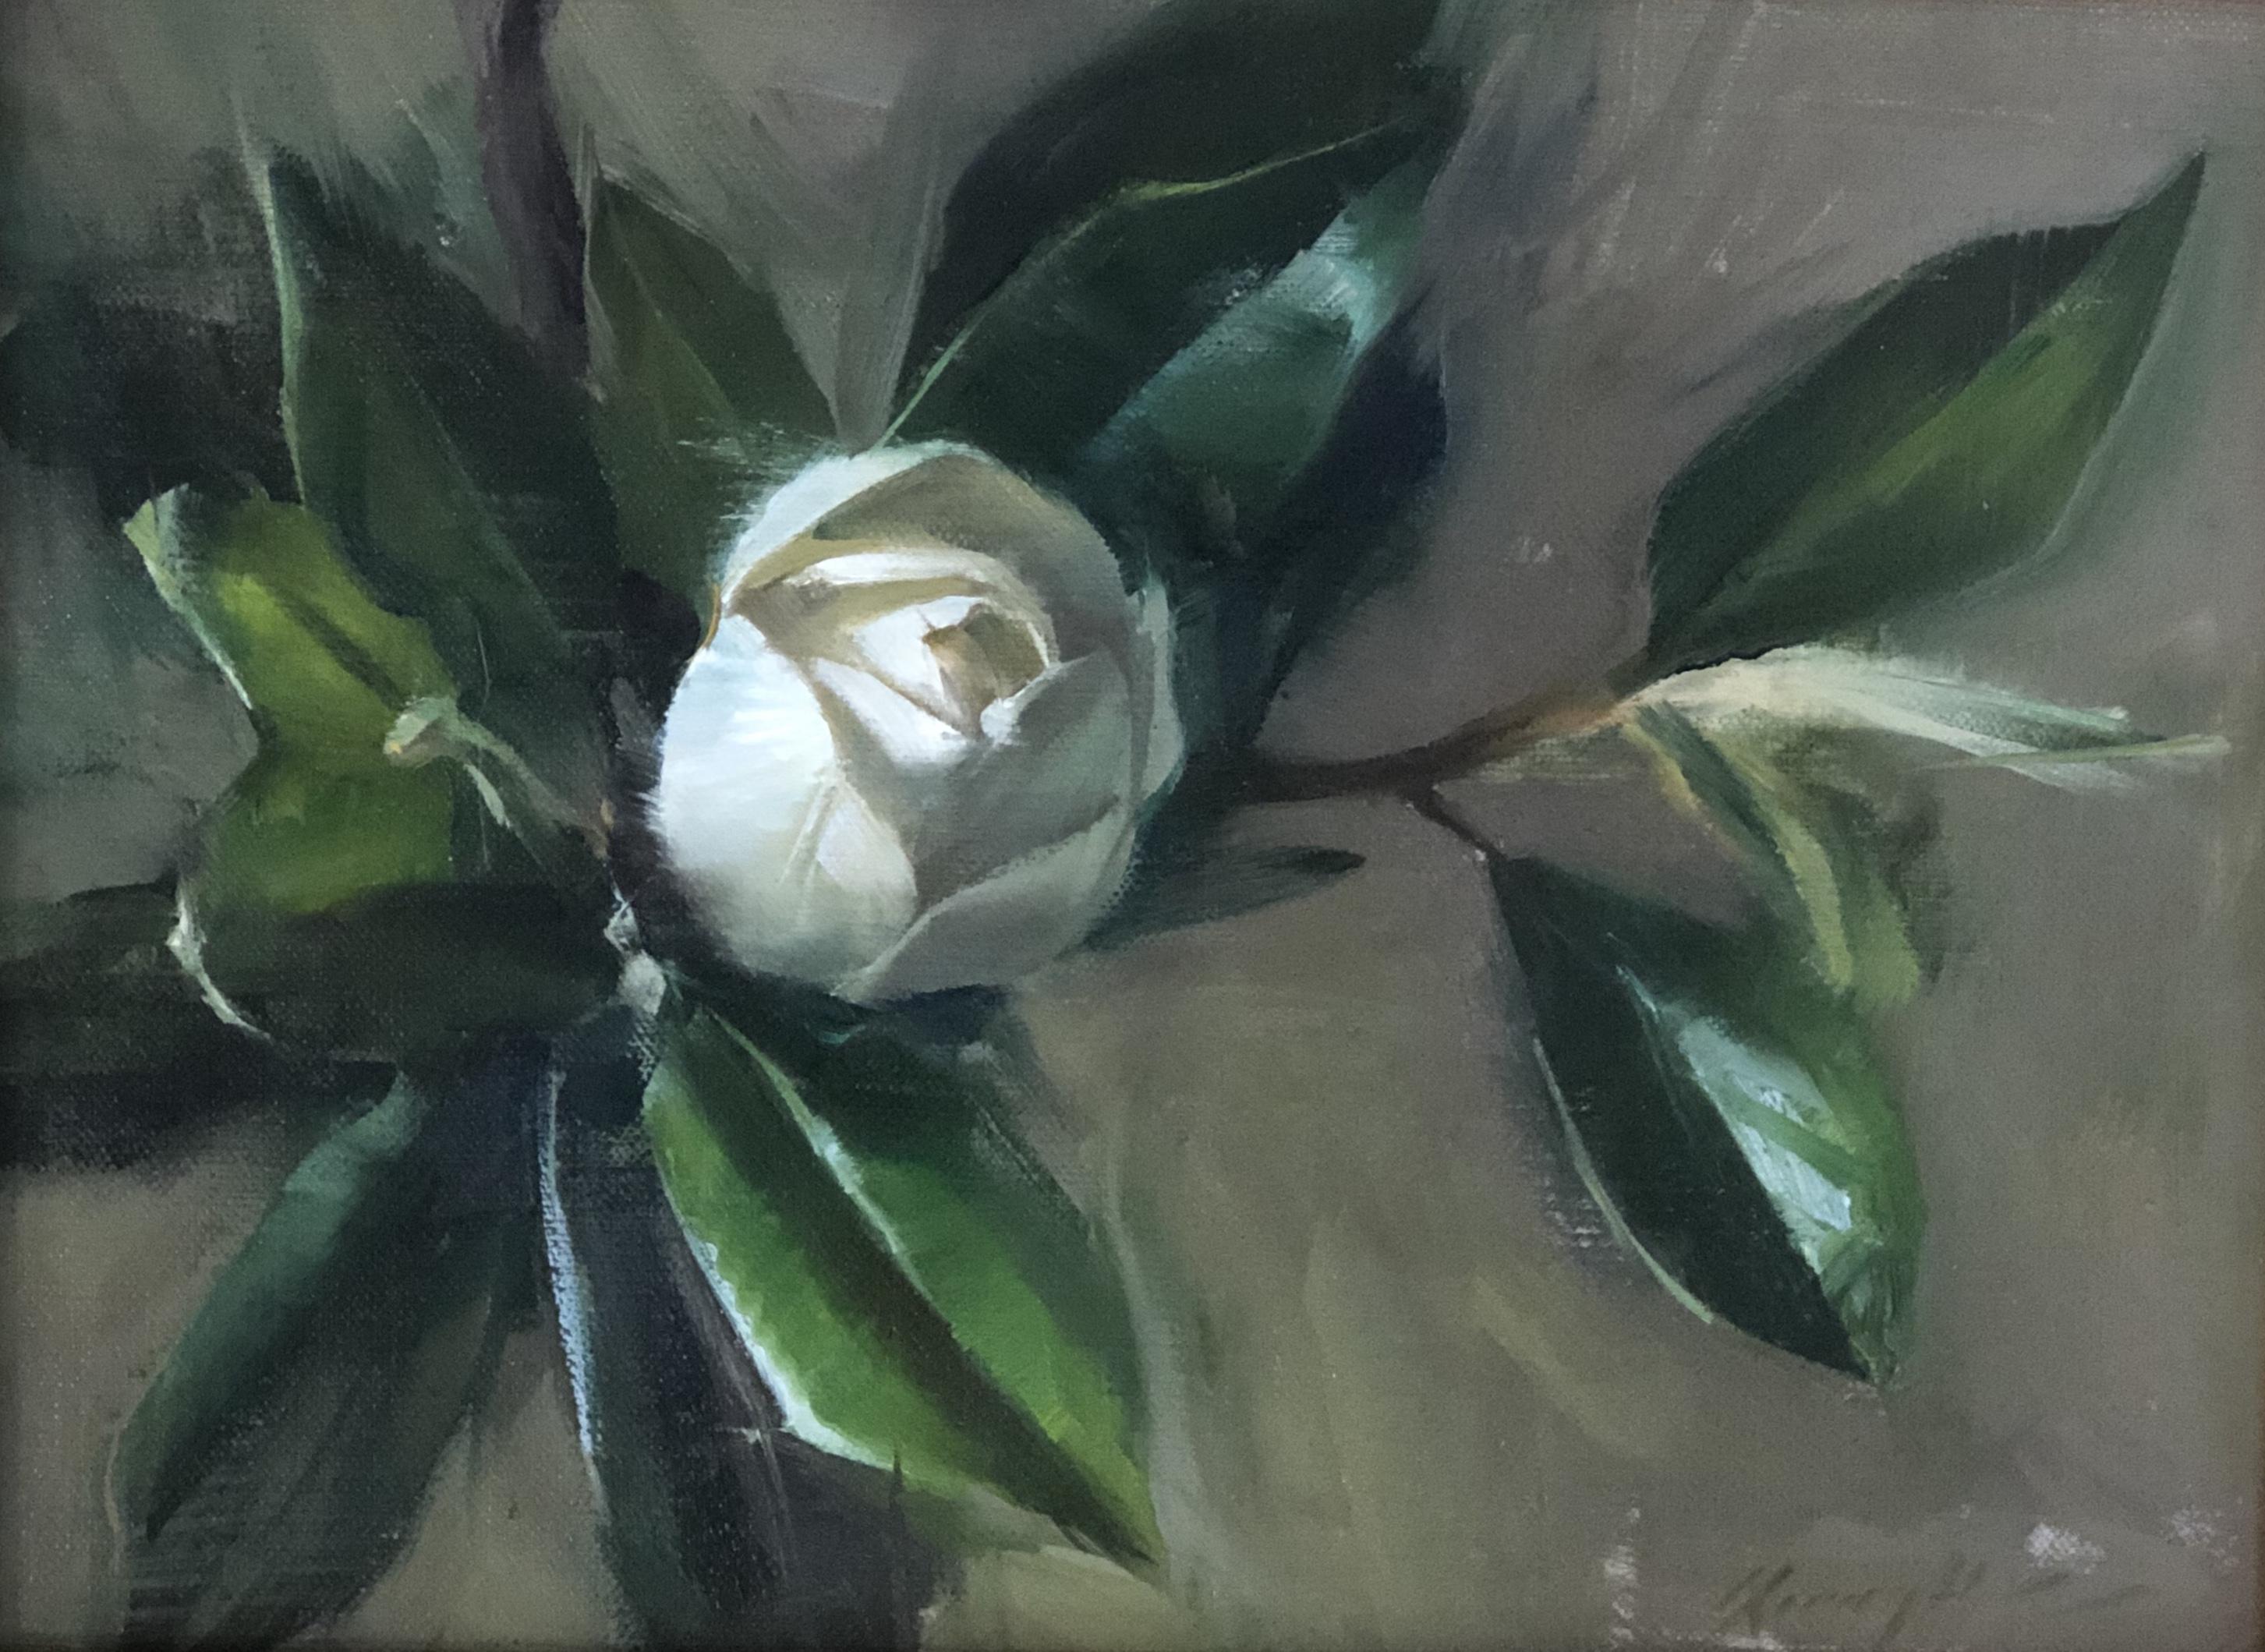 Budding Magnolia